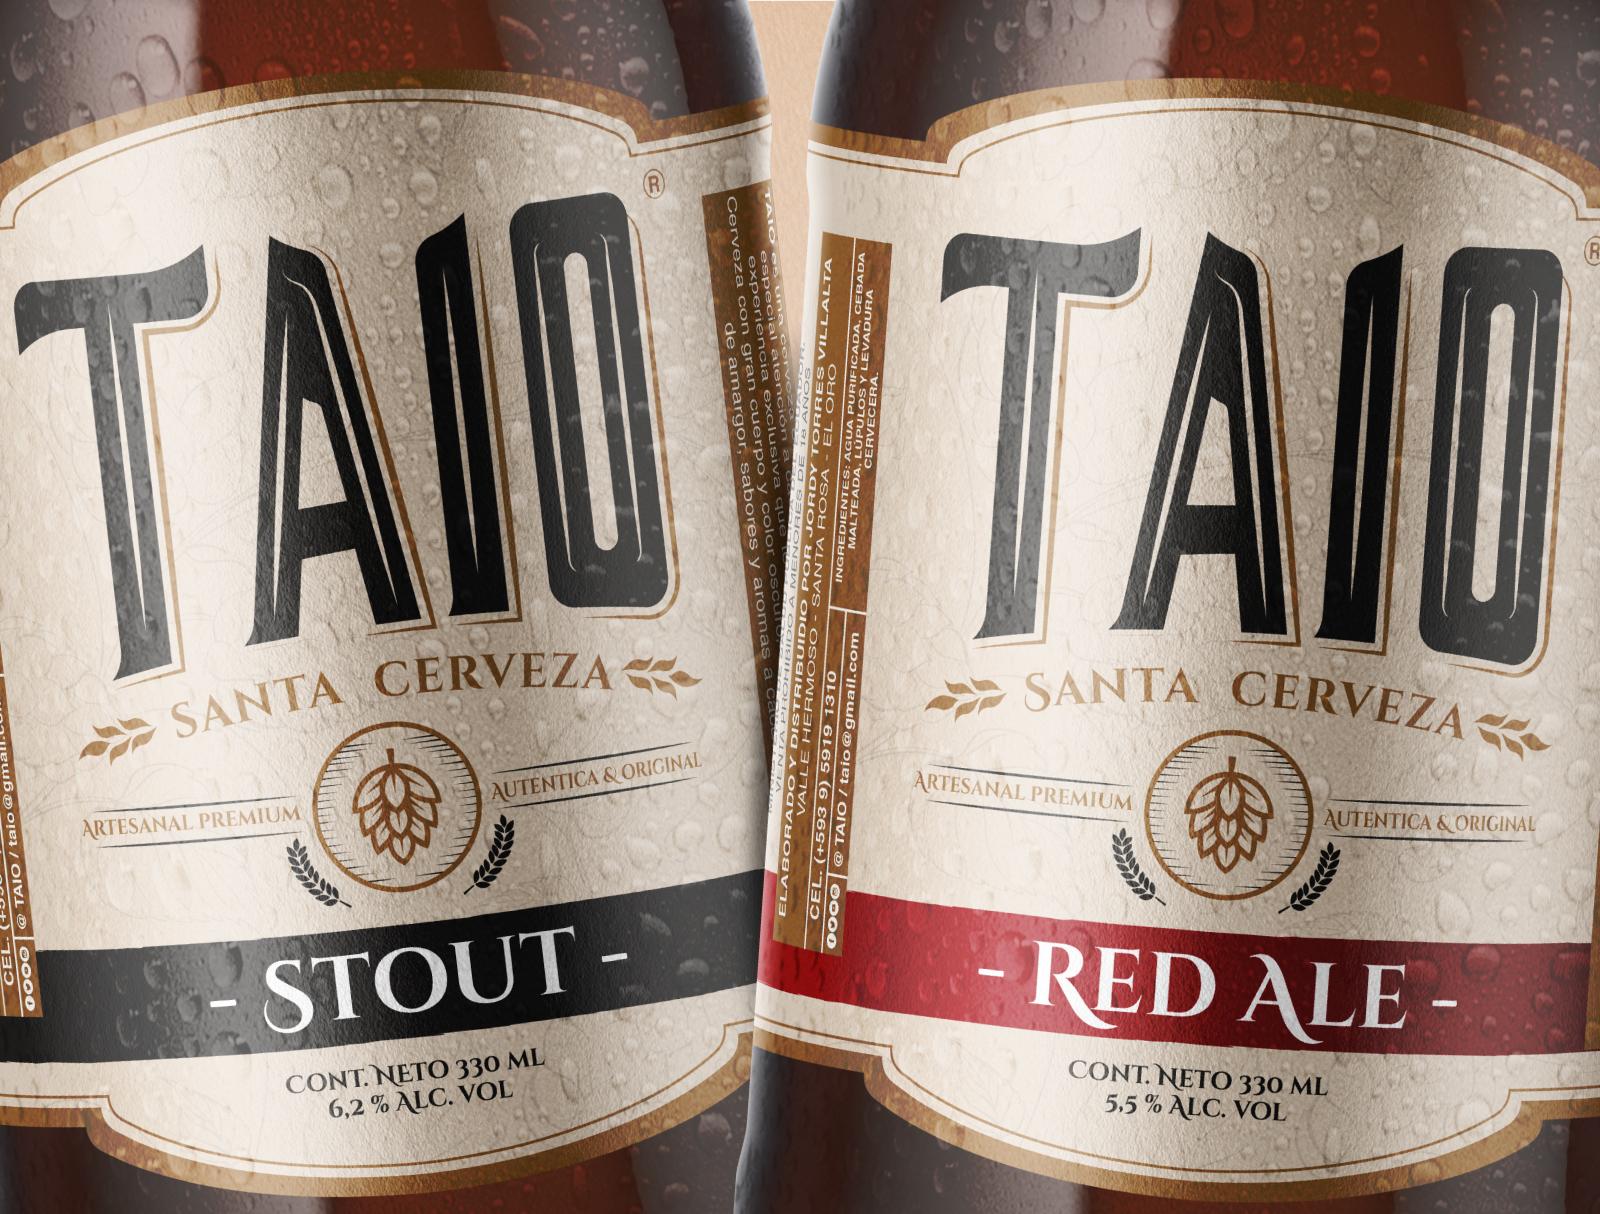 Diseño de Etiqueta de Cerveza Taio